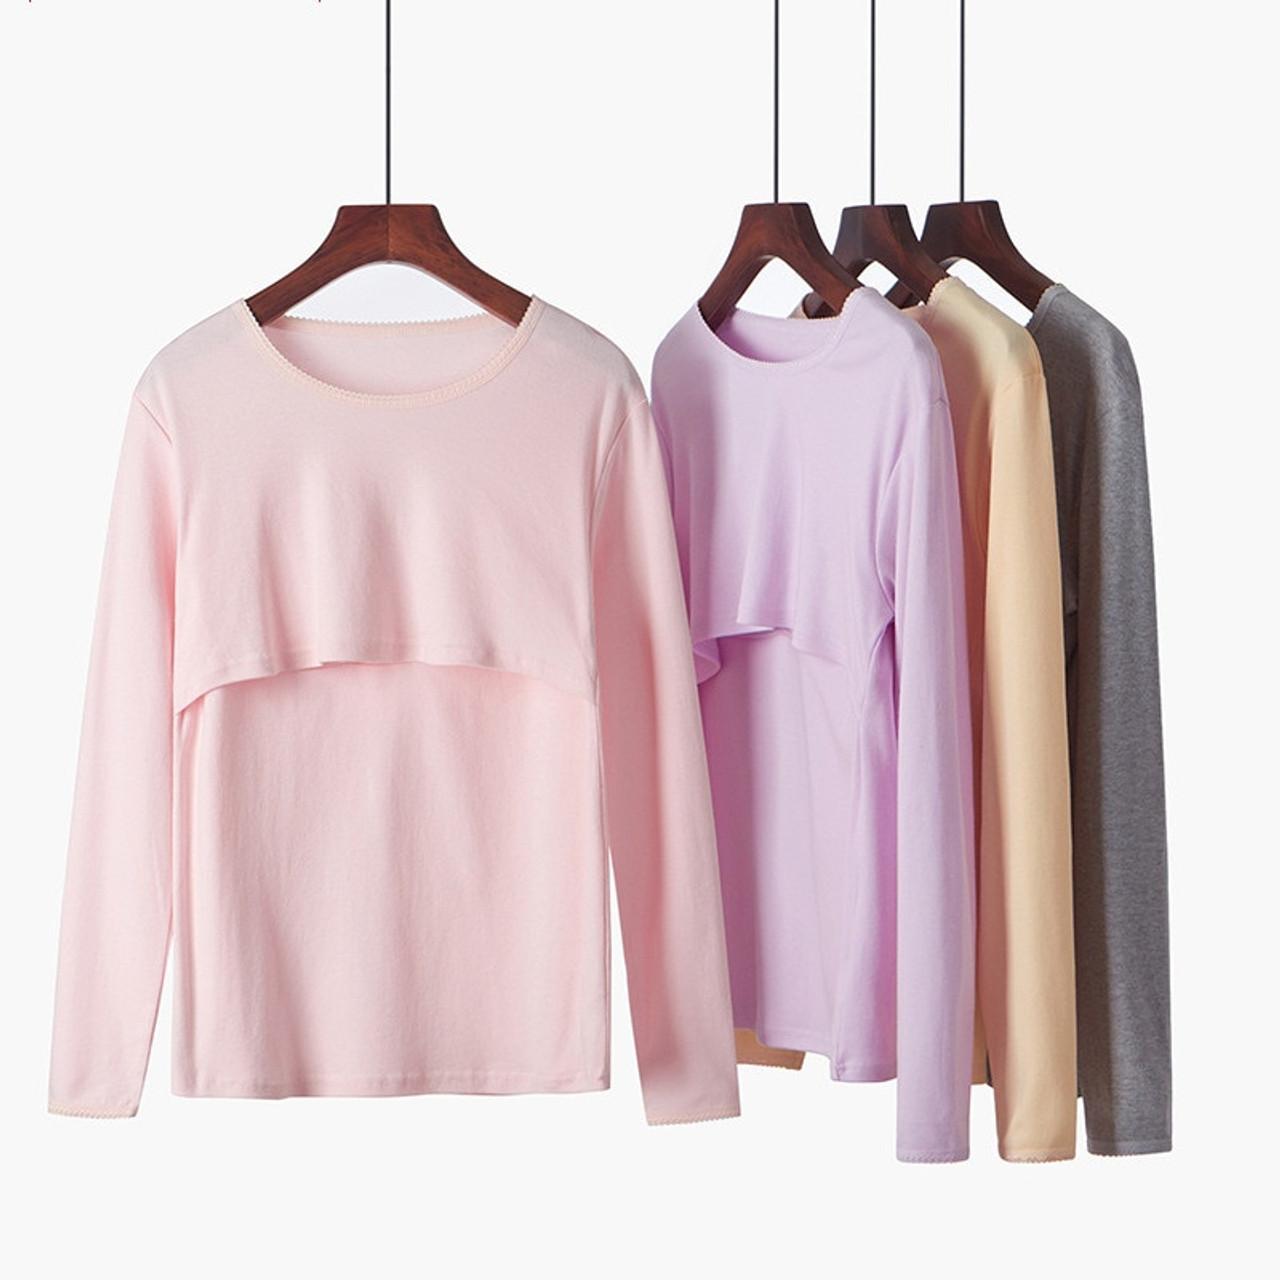 95fa619f6ae73 maternity tops for pregnant women nursing tops nursing shirts breastfeeding  t shirt pregnancy breast feeding shirt ...